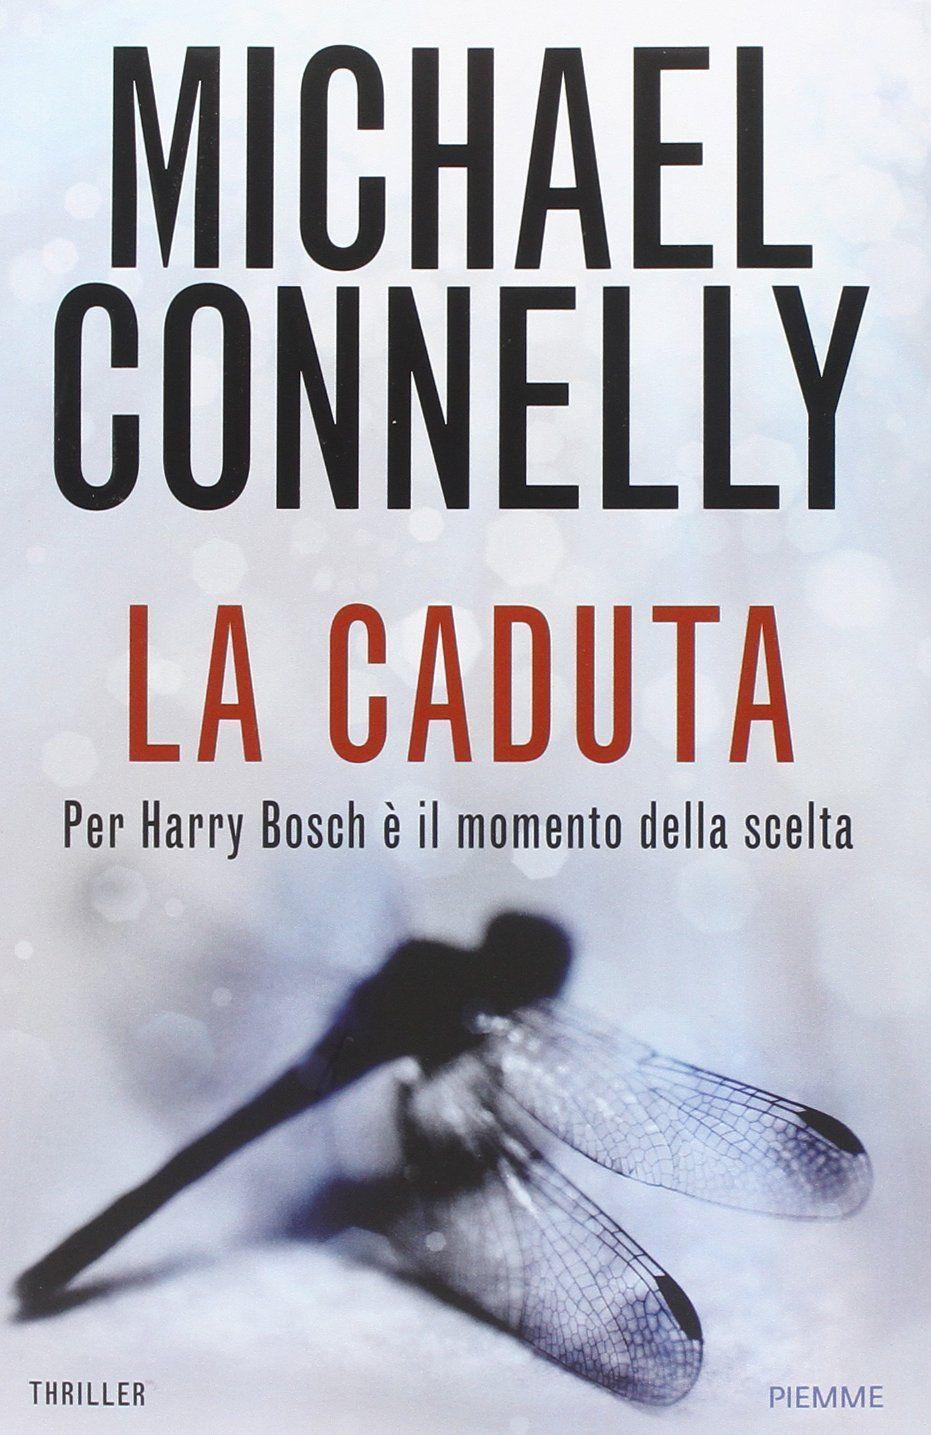 La caduta Michael Connelly